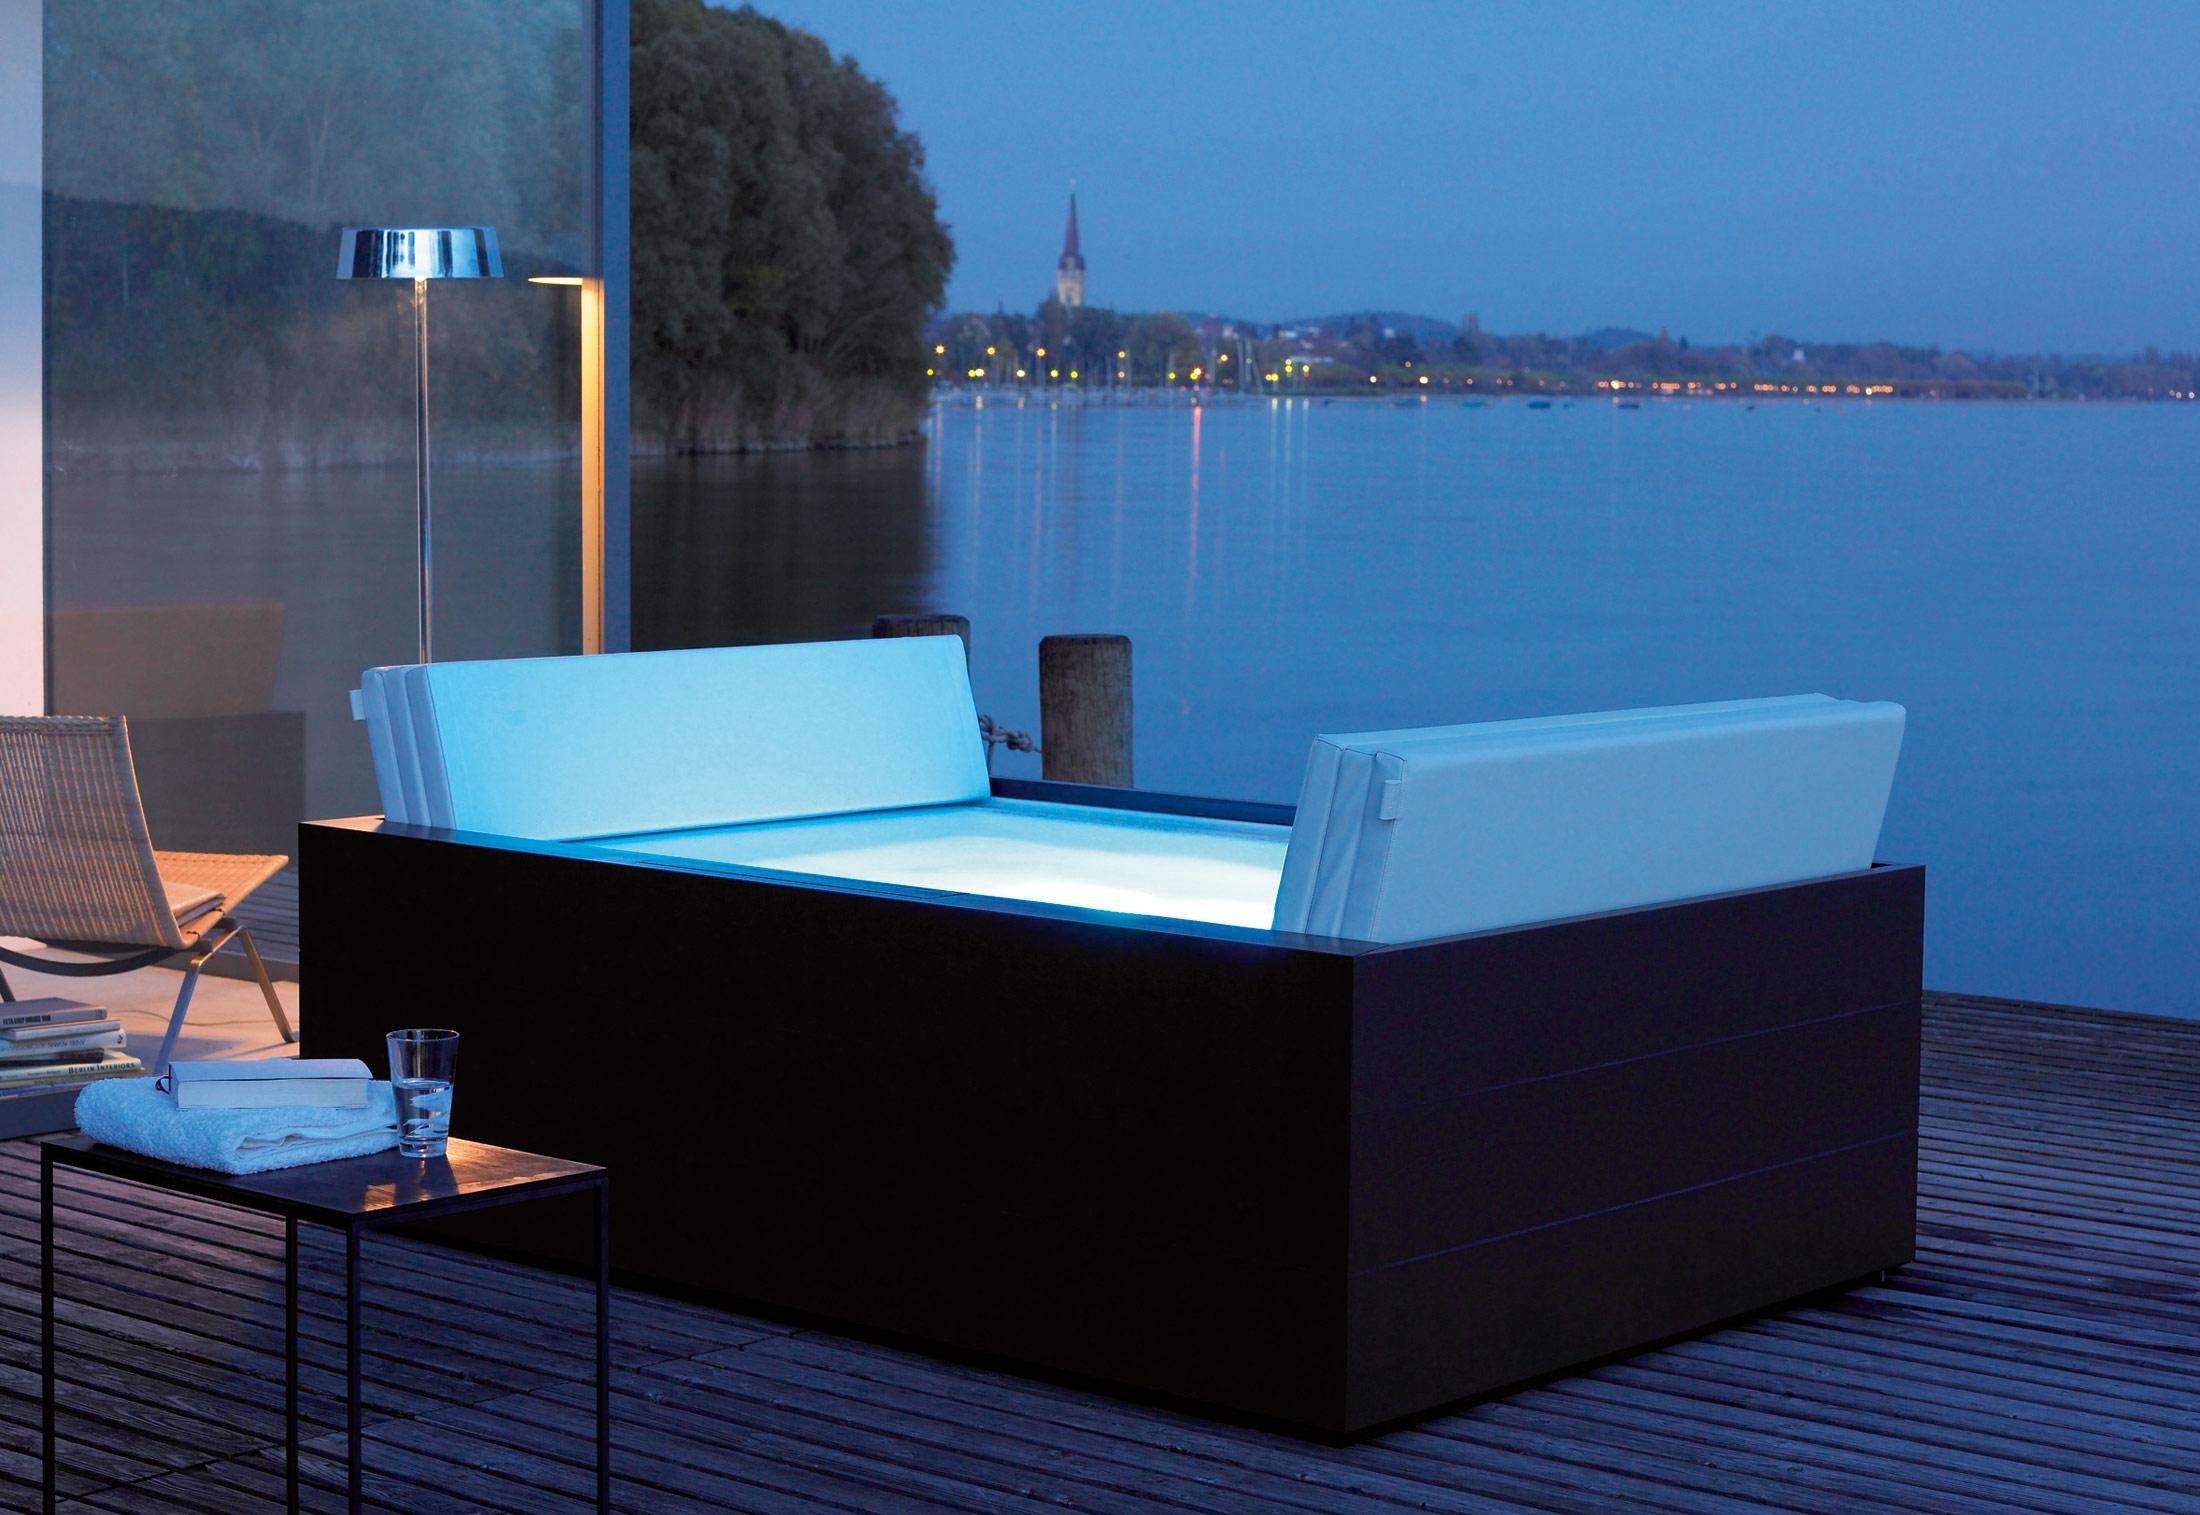 Sundeck pool by duravit stylepark - Jacuzzi piscina exterior ...